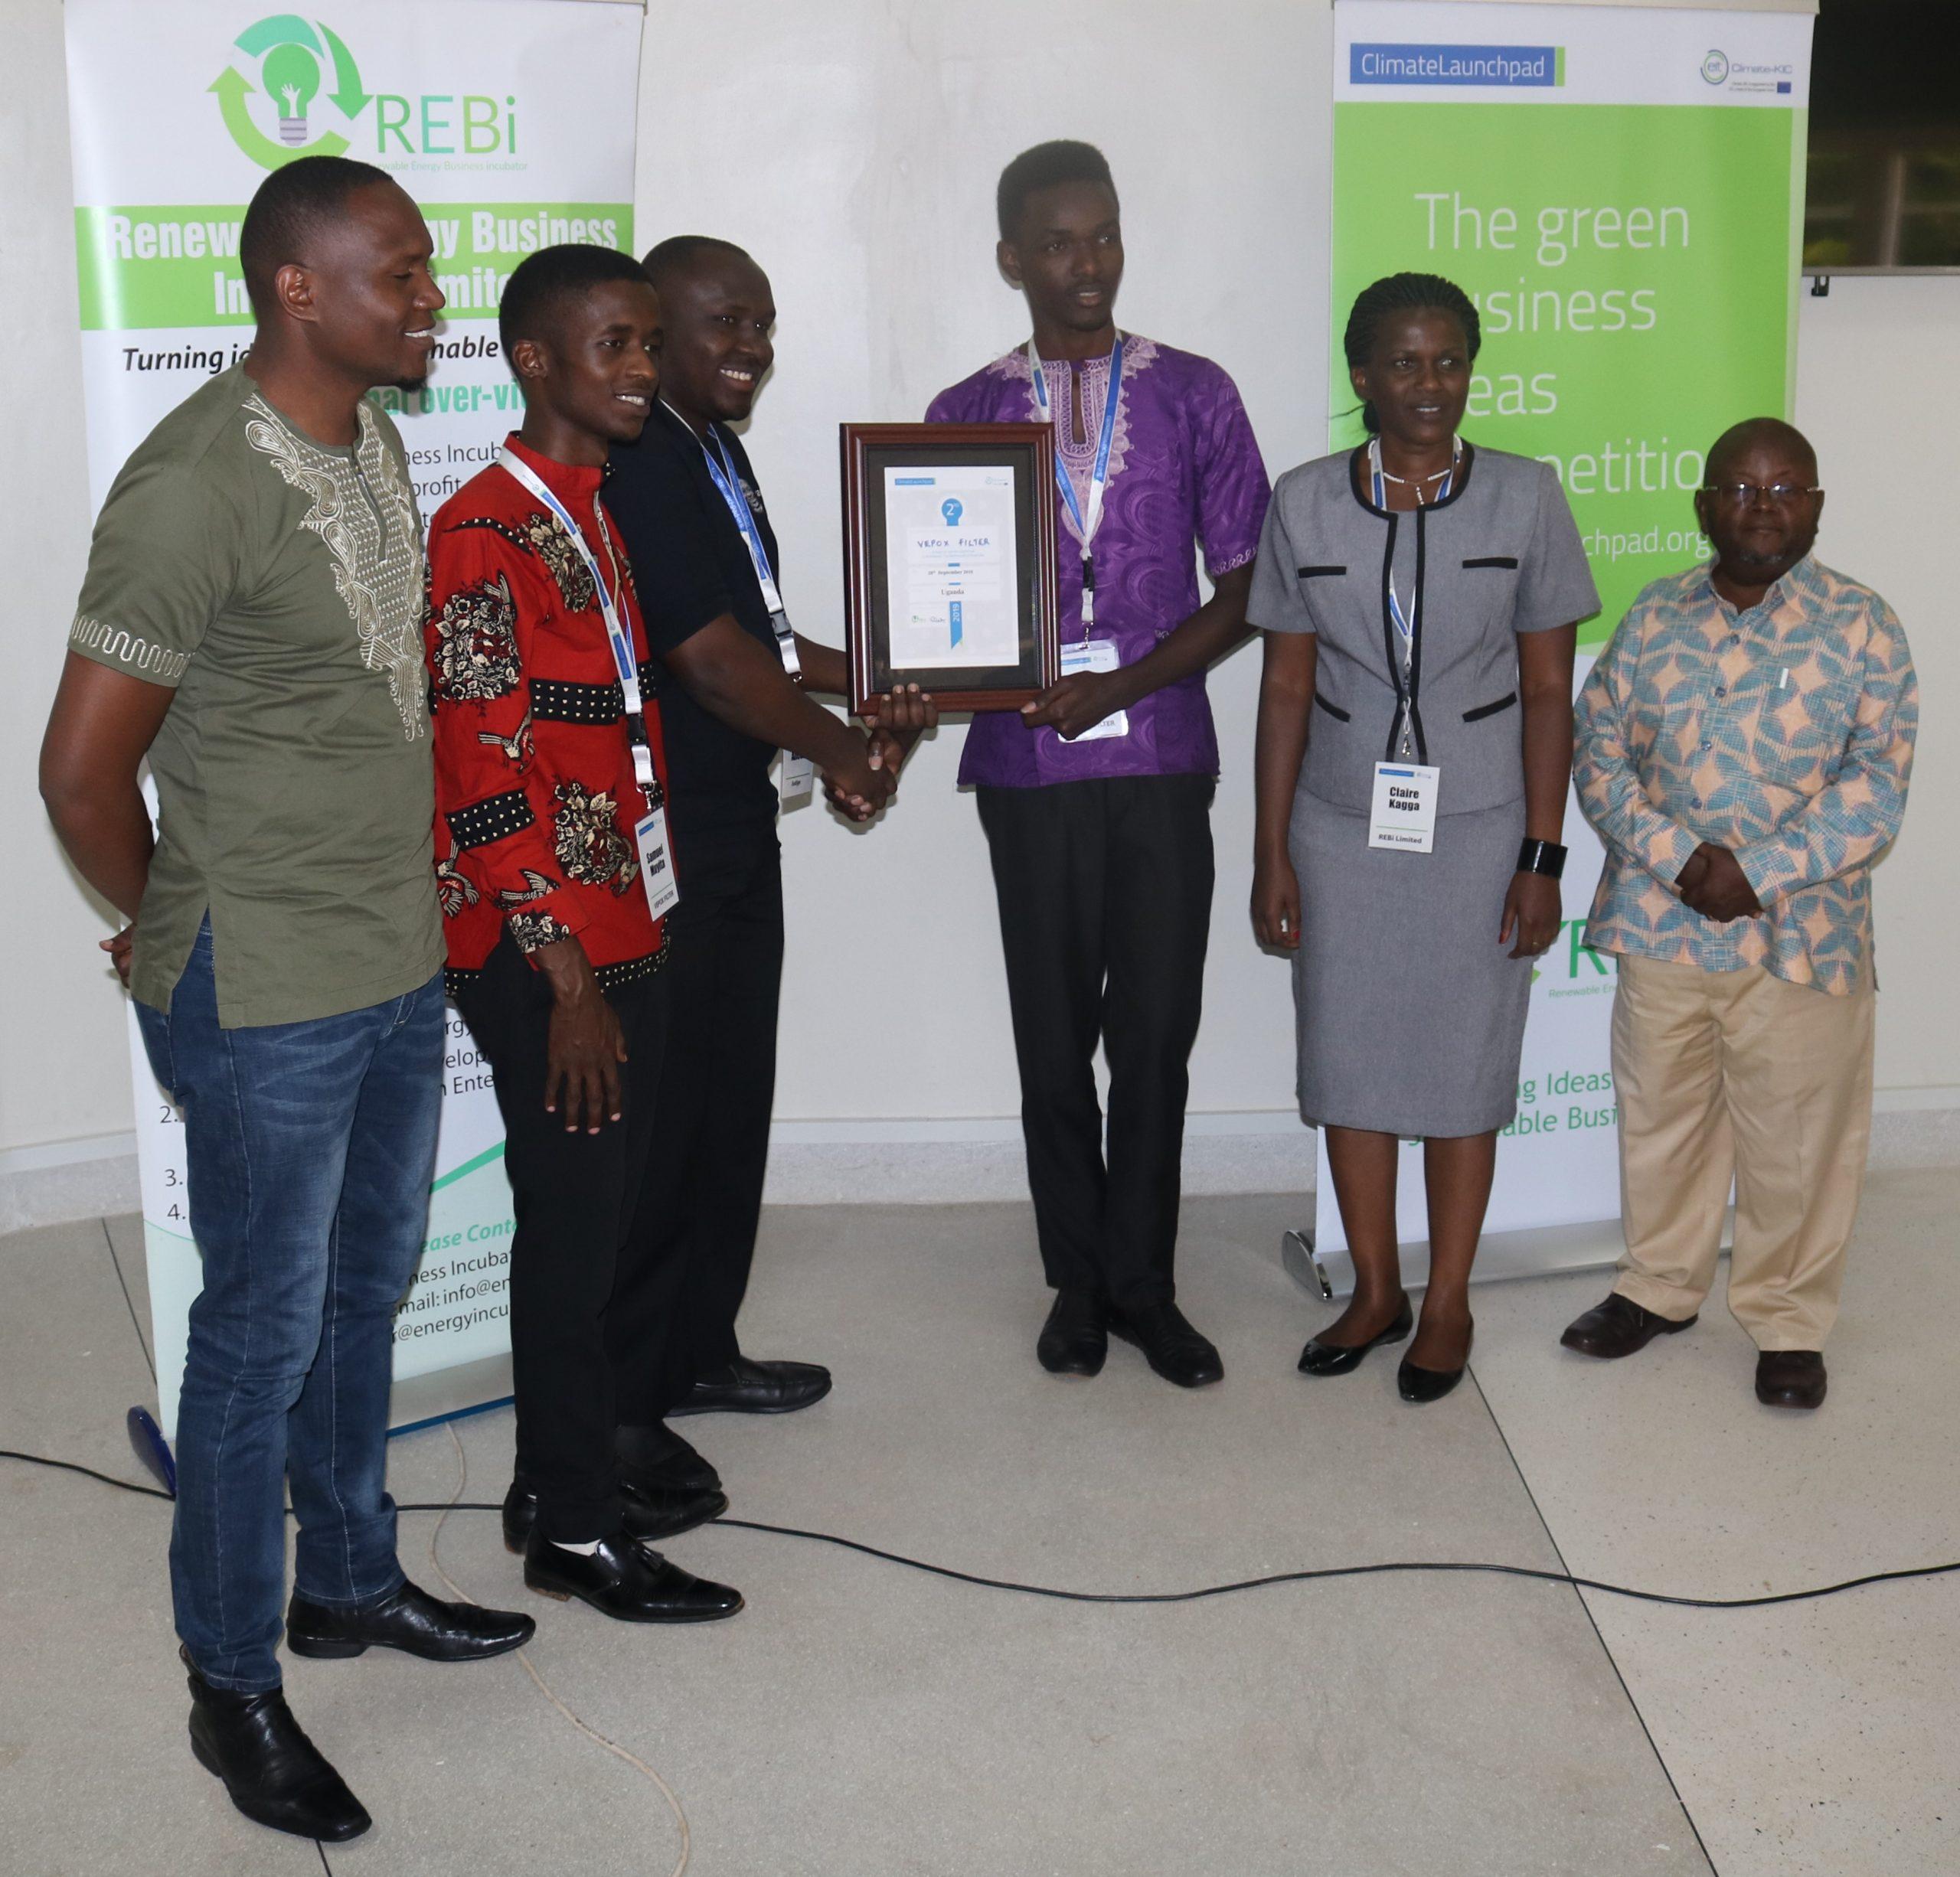 Climate Launchpad Competition Uganda 2019